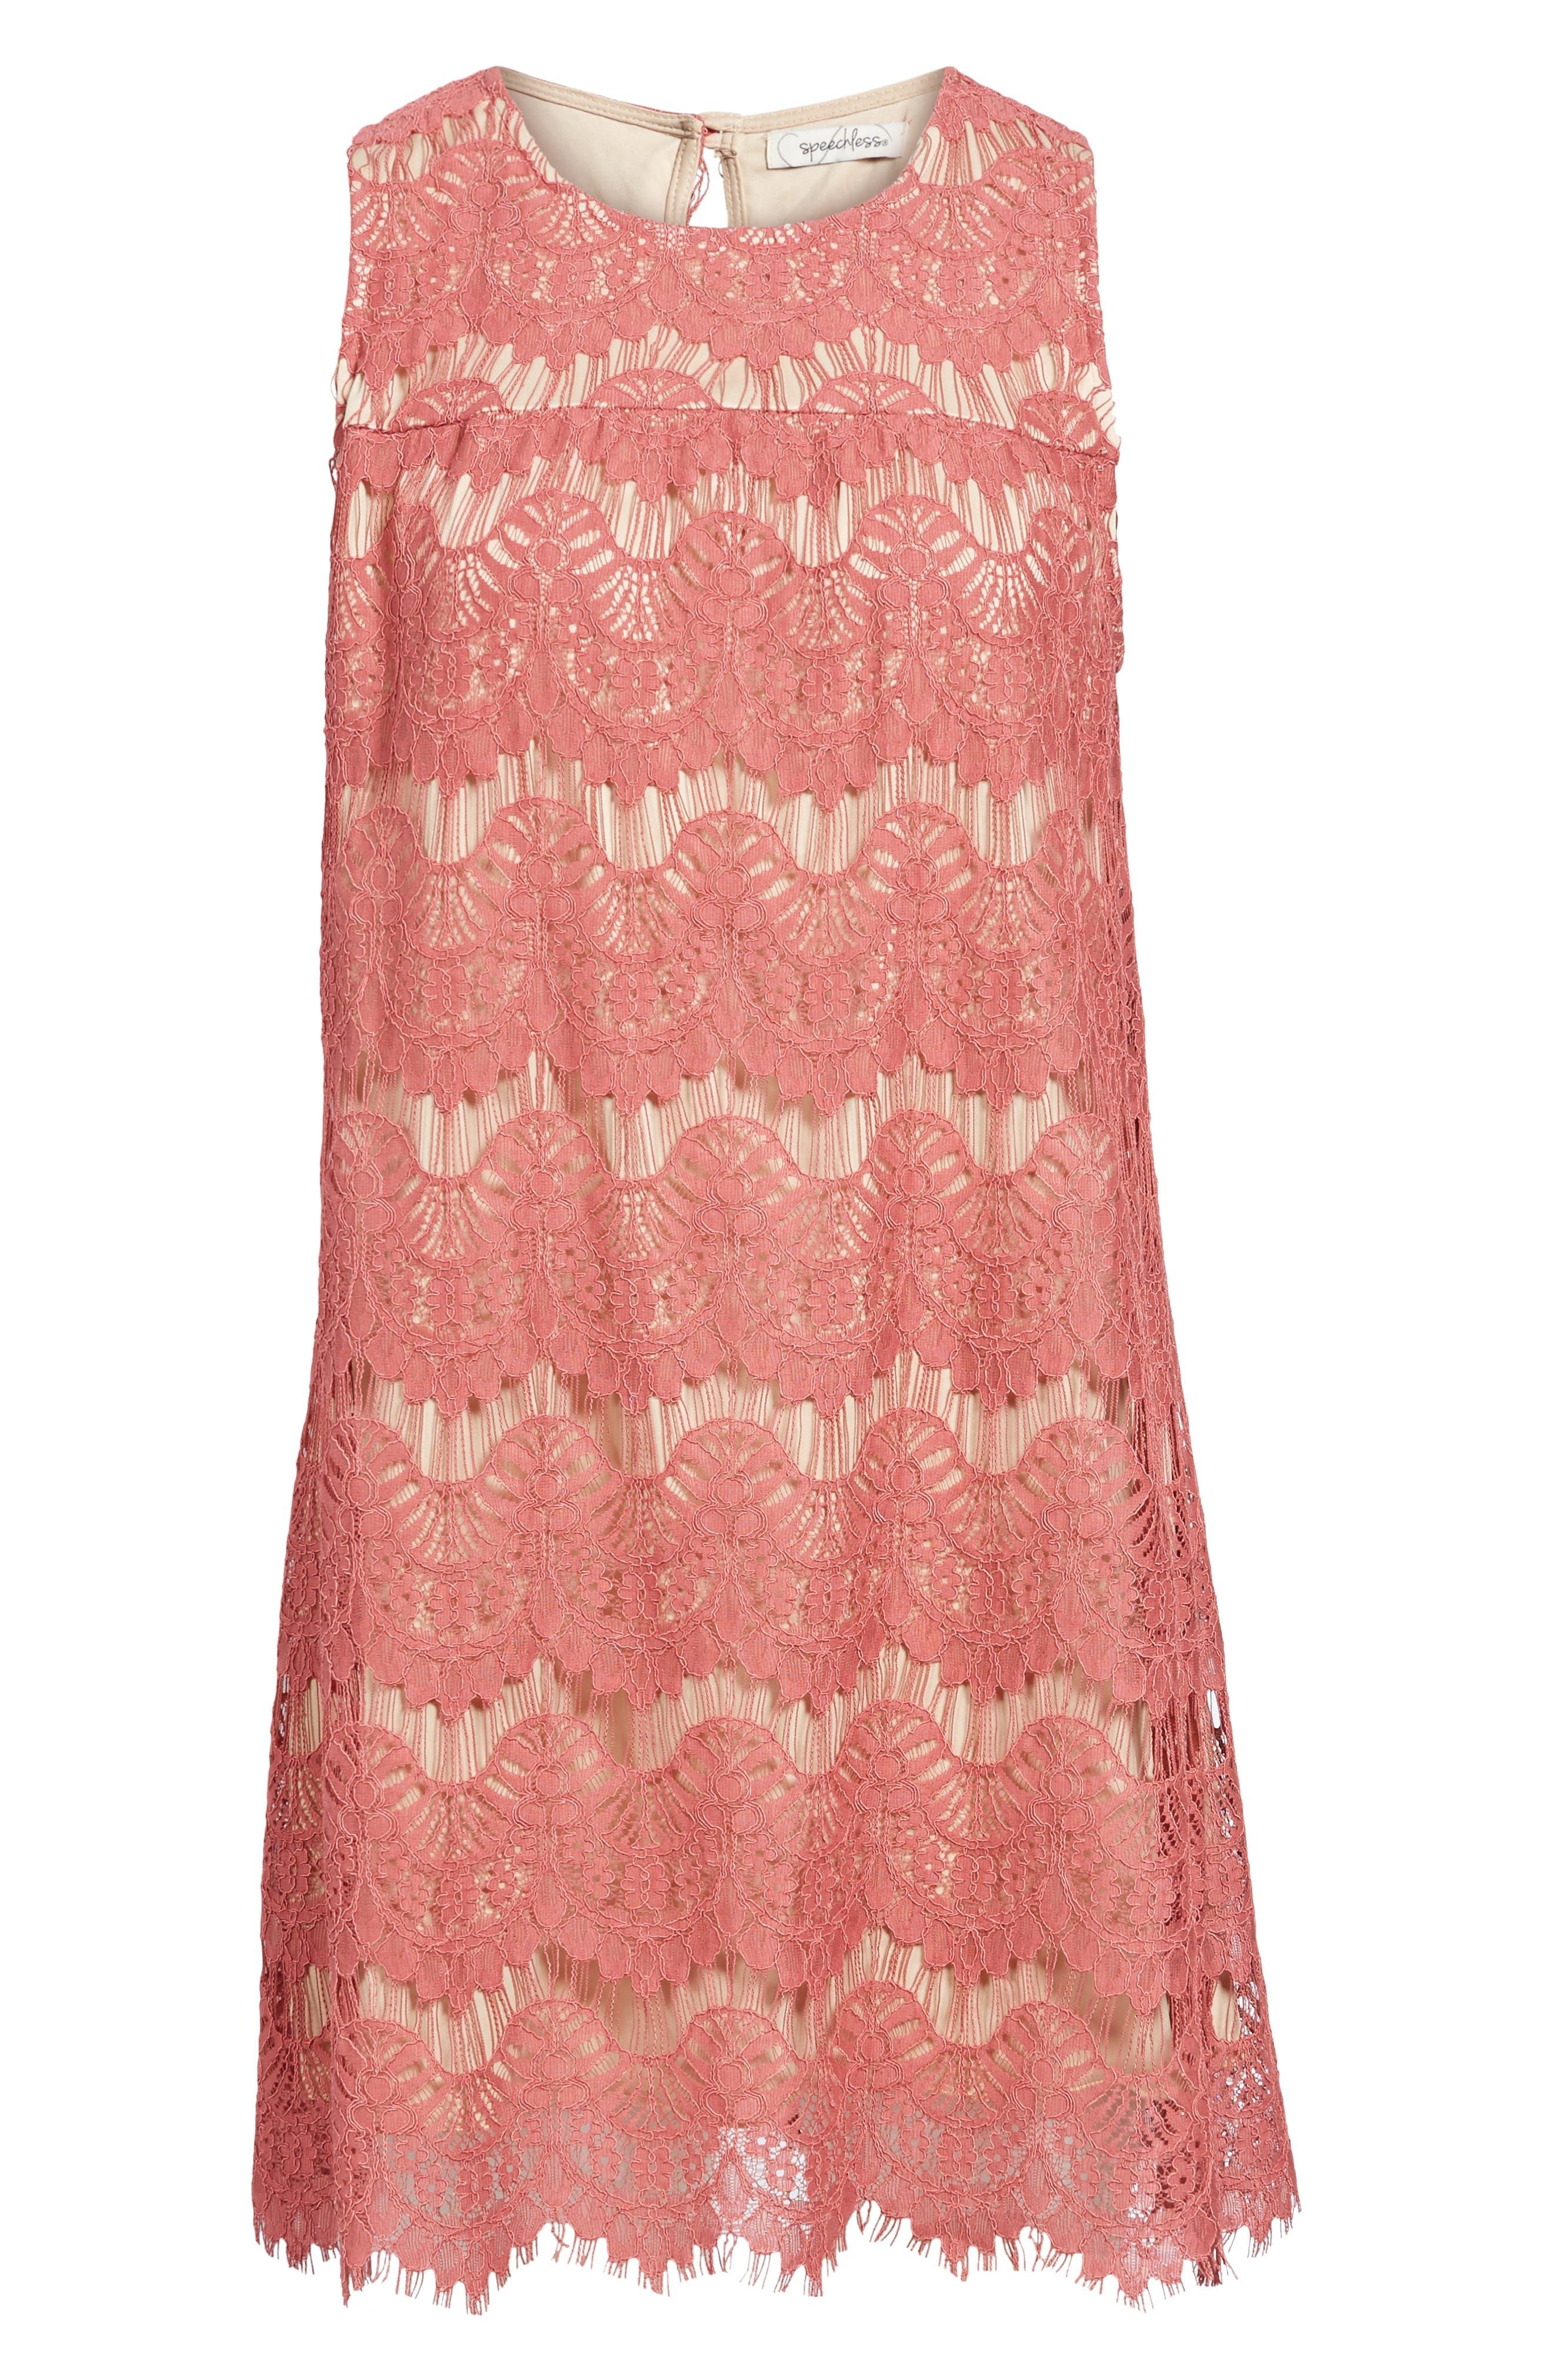 Lace Shift Dress,                             Alternate thumbnail 6, color,                             Mauve/ Nude